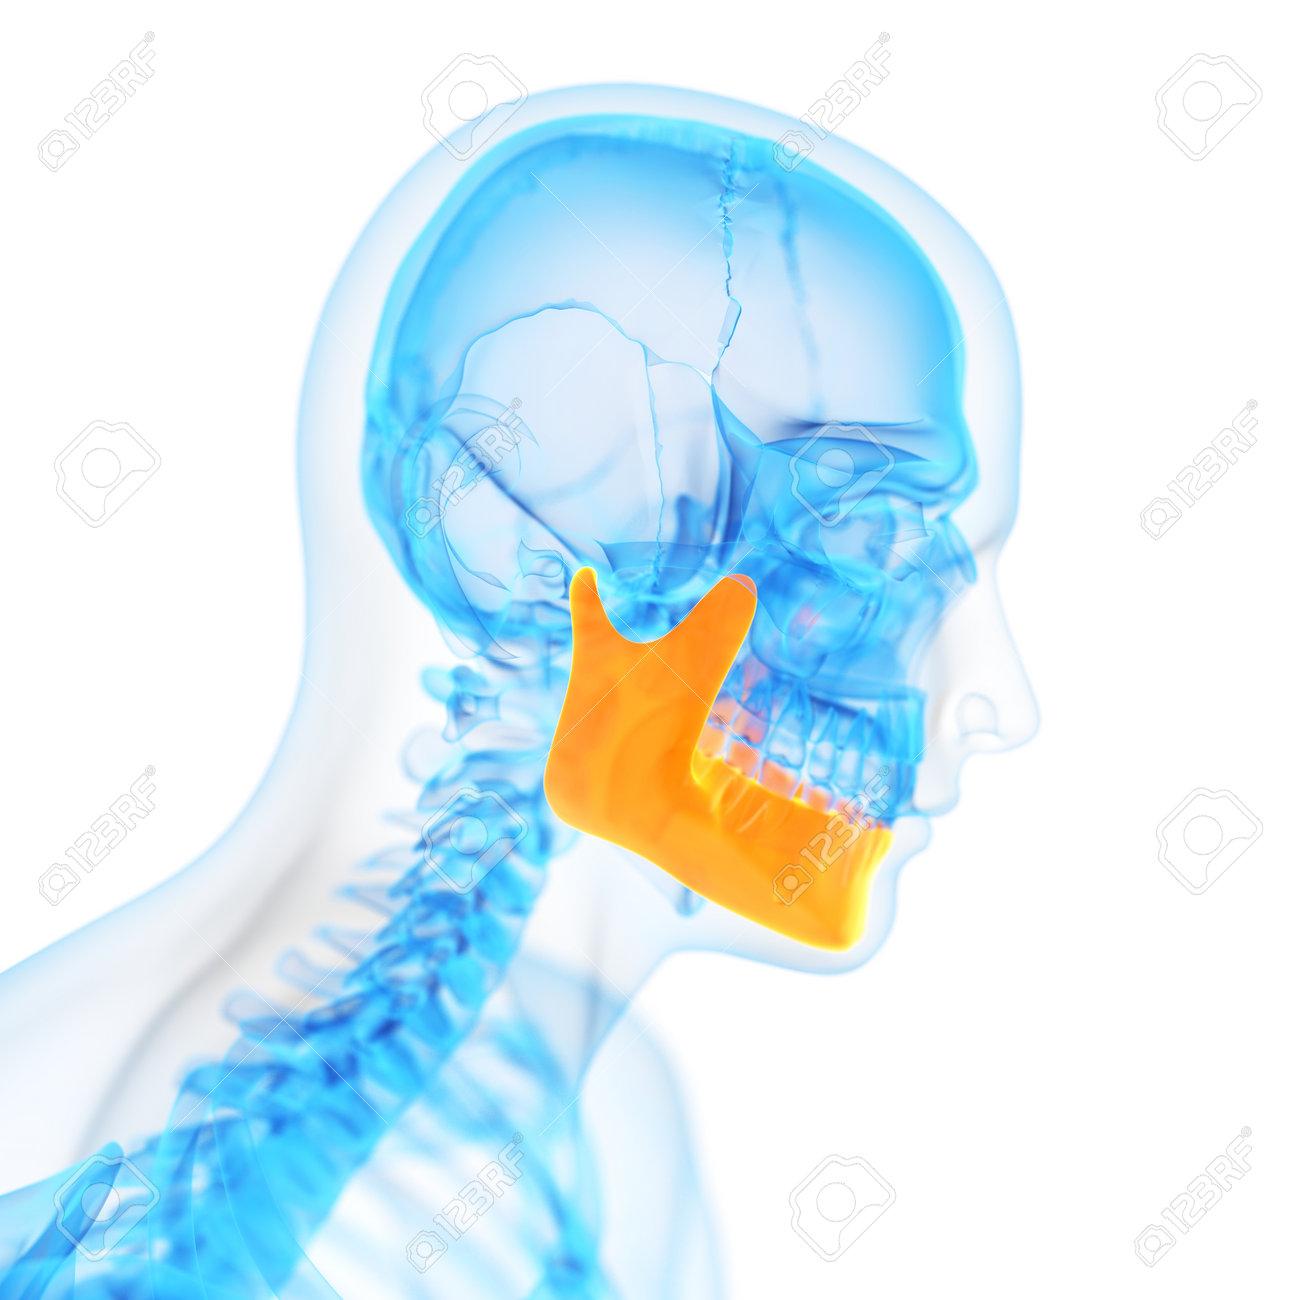 medical 3d illustration of the jaw bone - 32521630